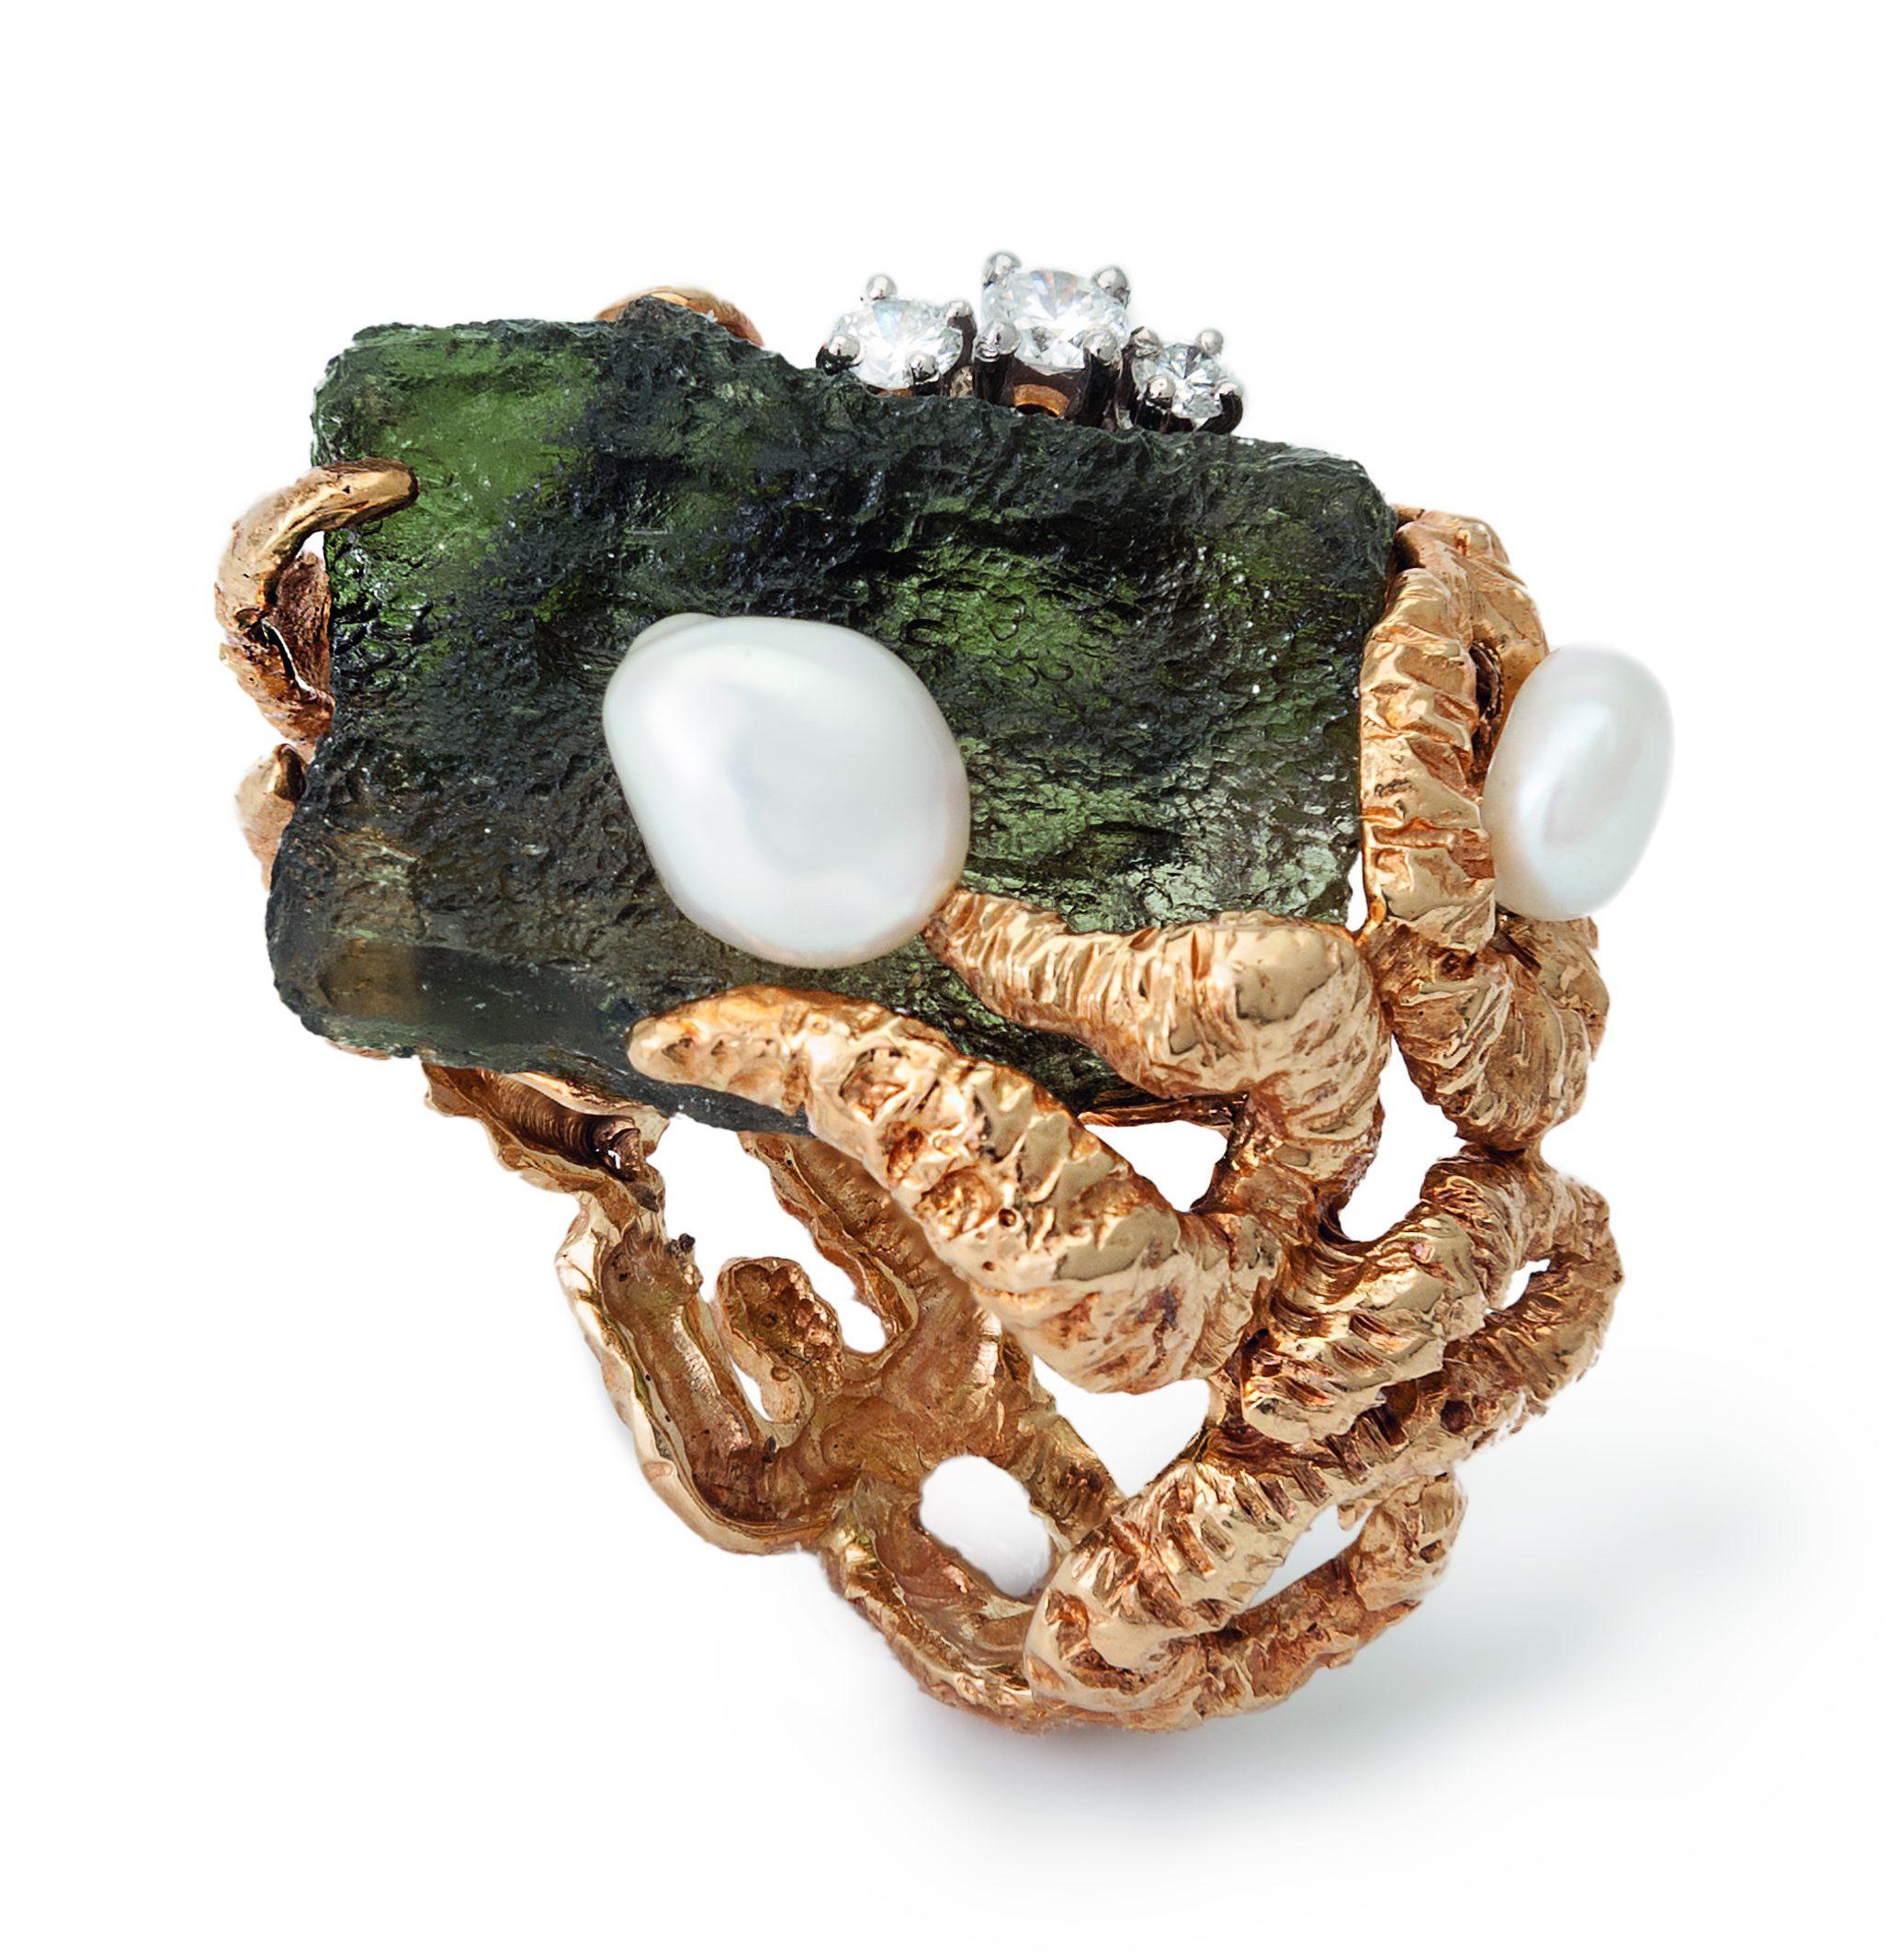 Gilbert Albert, ring, 1960-1969. Collectie Kimberly Klosterman. Foto Kimberly Klosterman, goud, parel, diamant